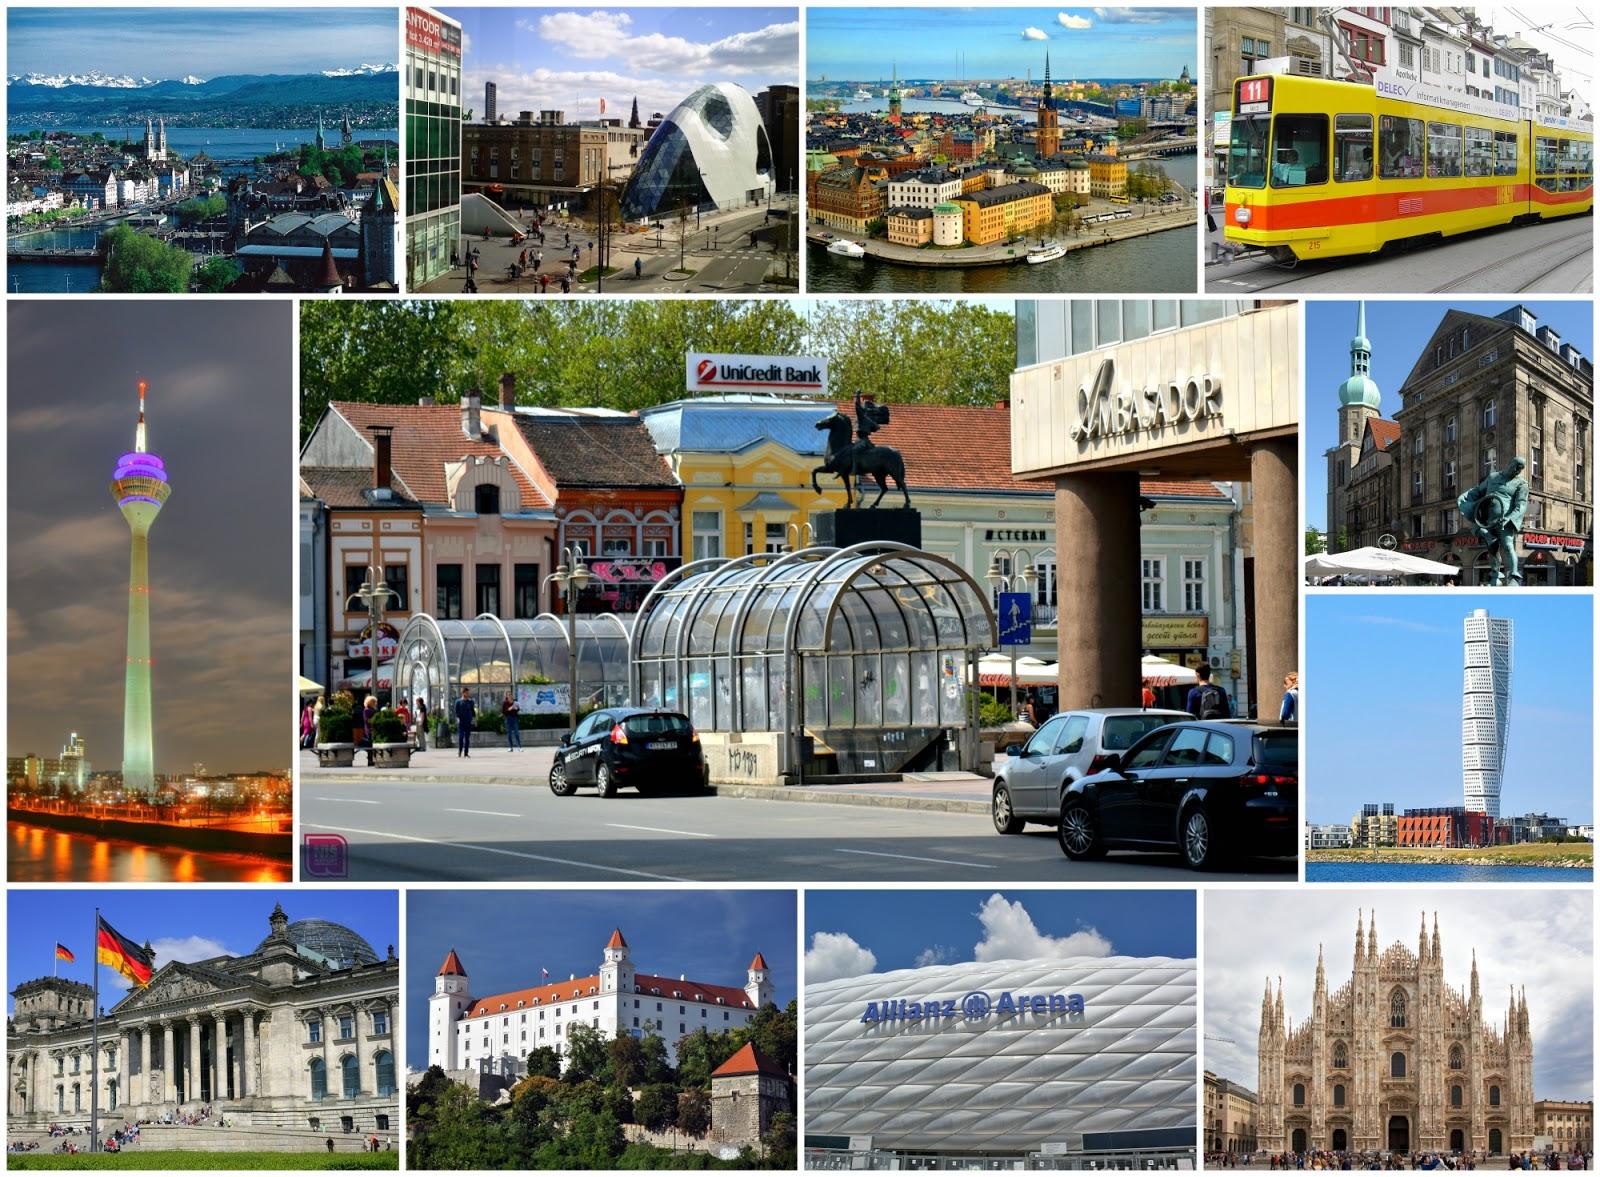 FLY FROM NIŠ: Sve o destinacijama iz Niša na jednom mestu